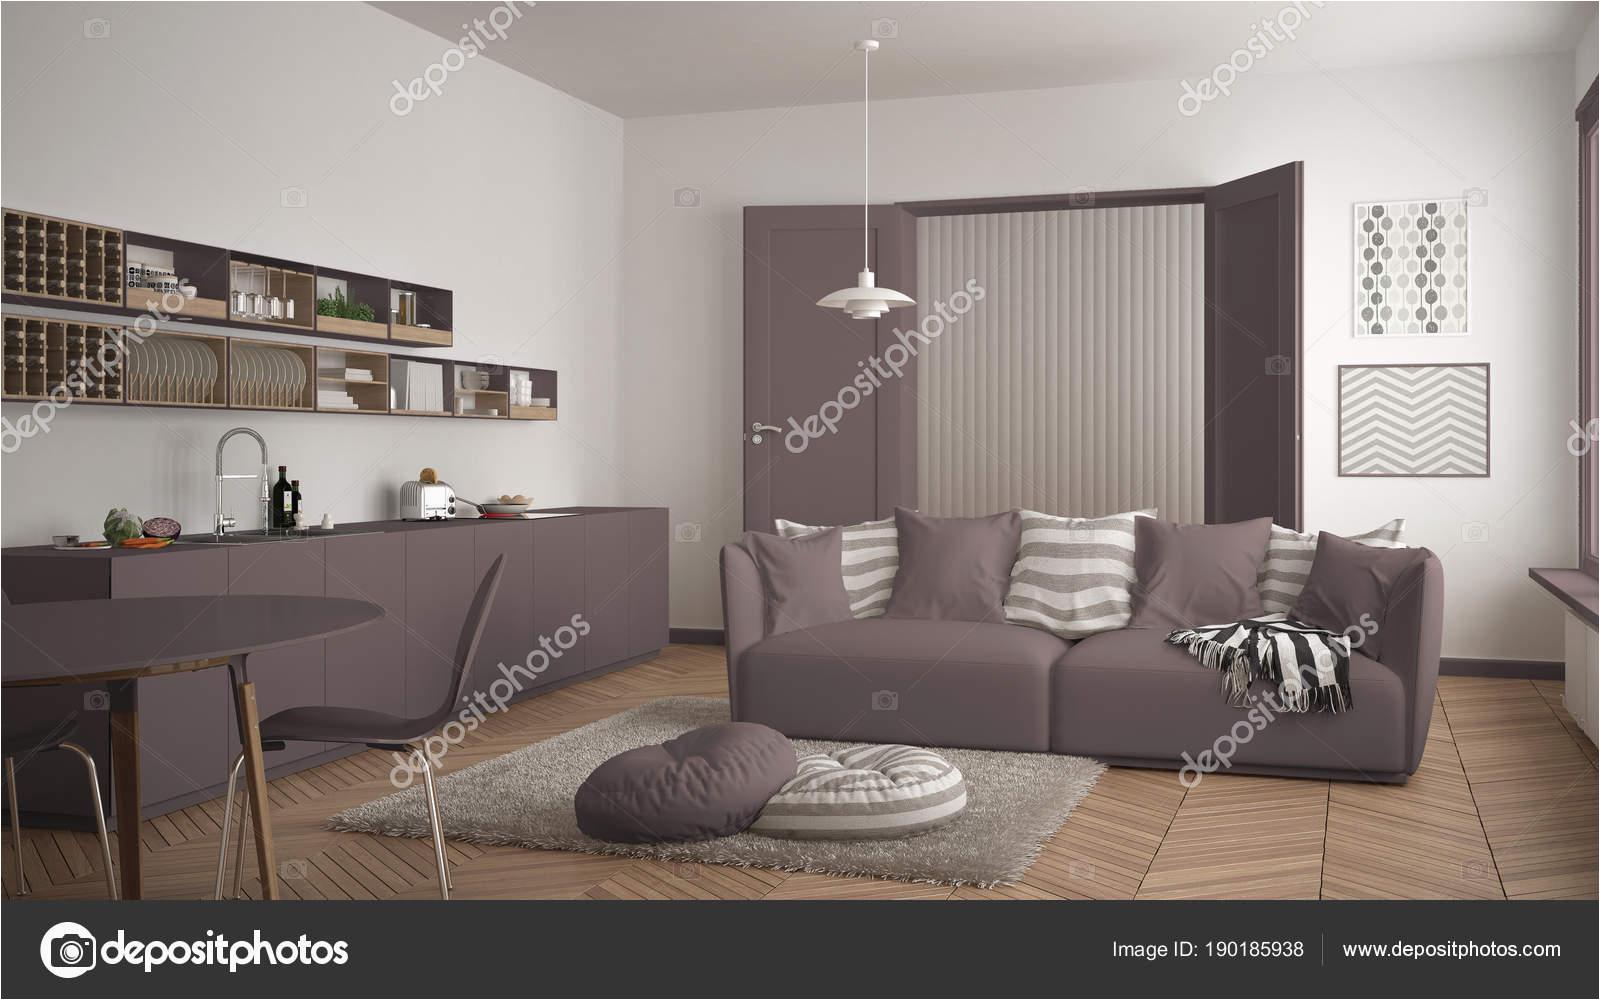 depositphotos stock photo scandinavian modern living room with